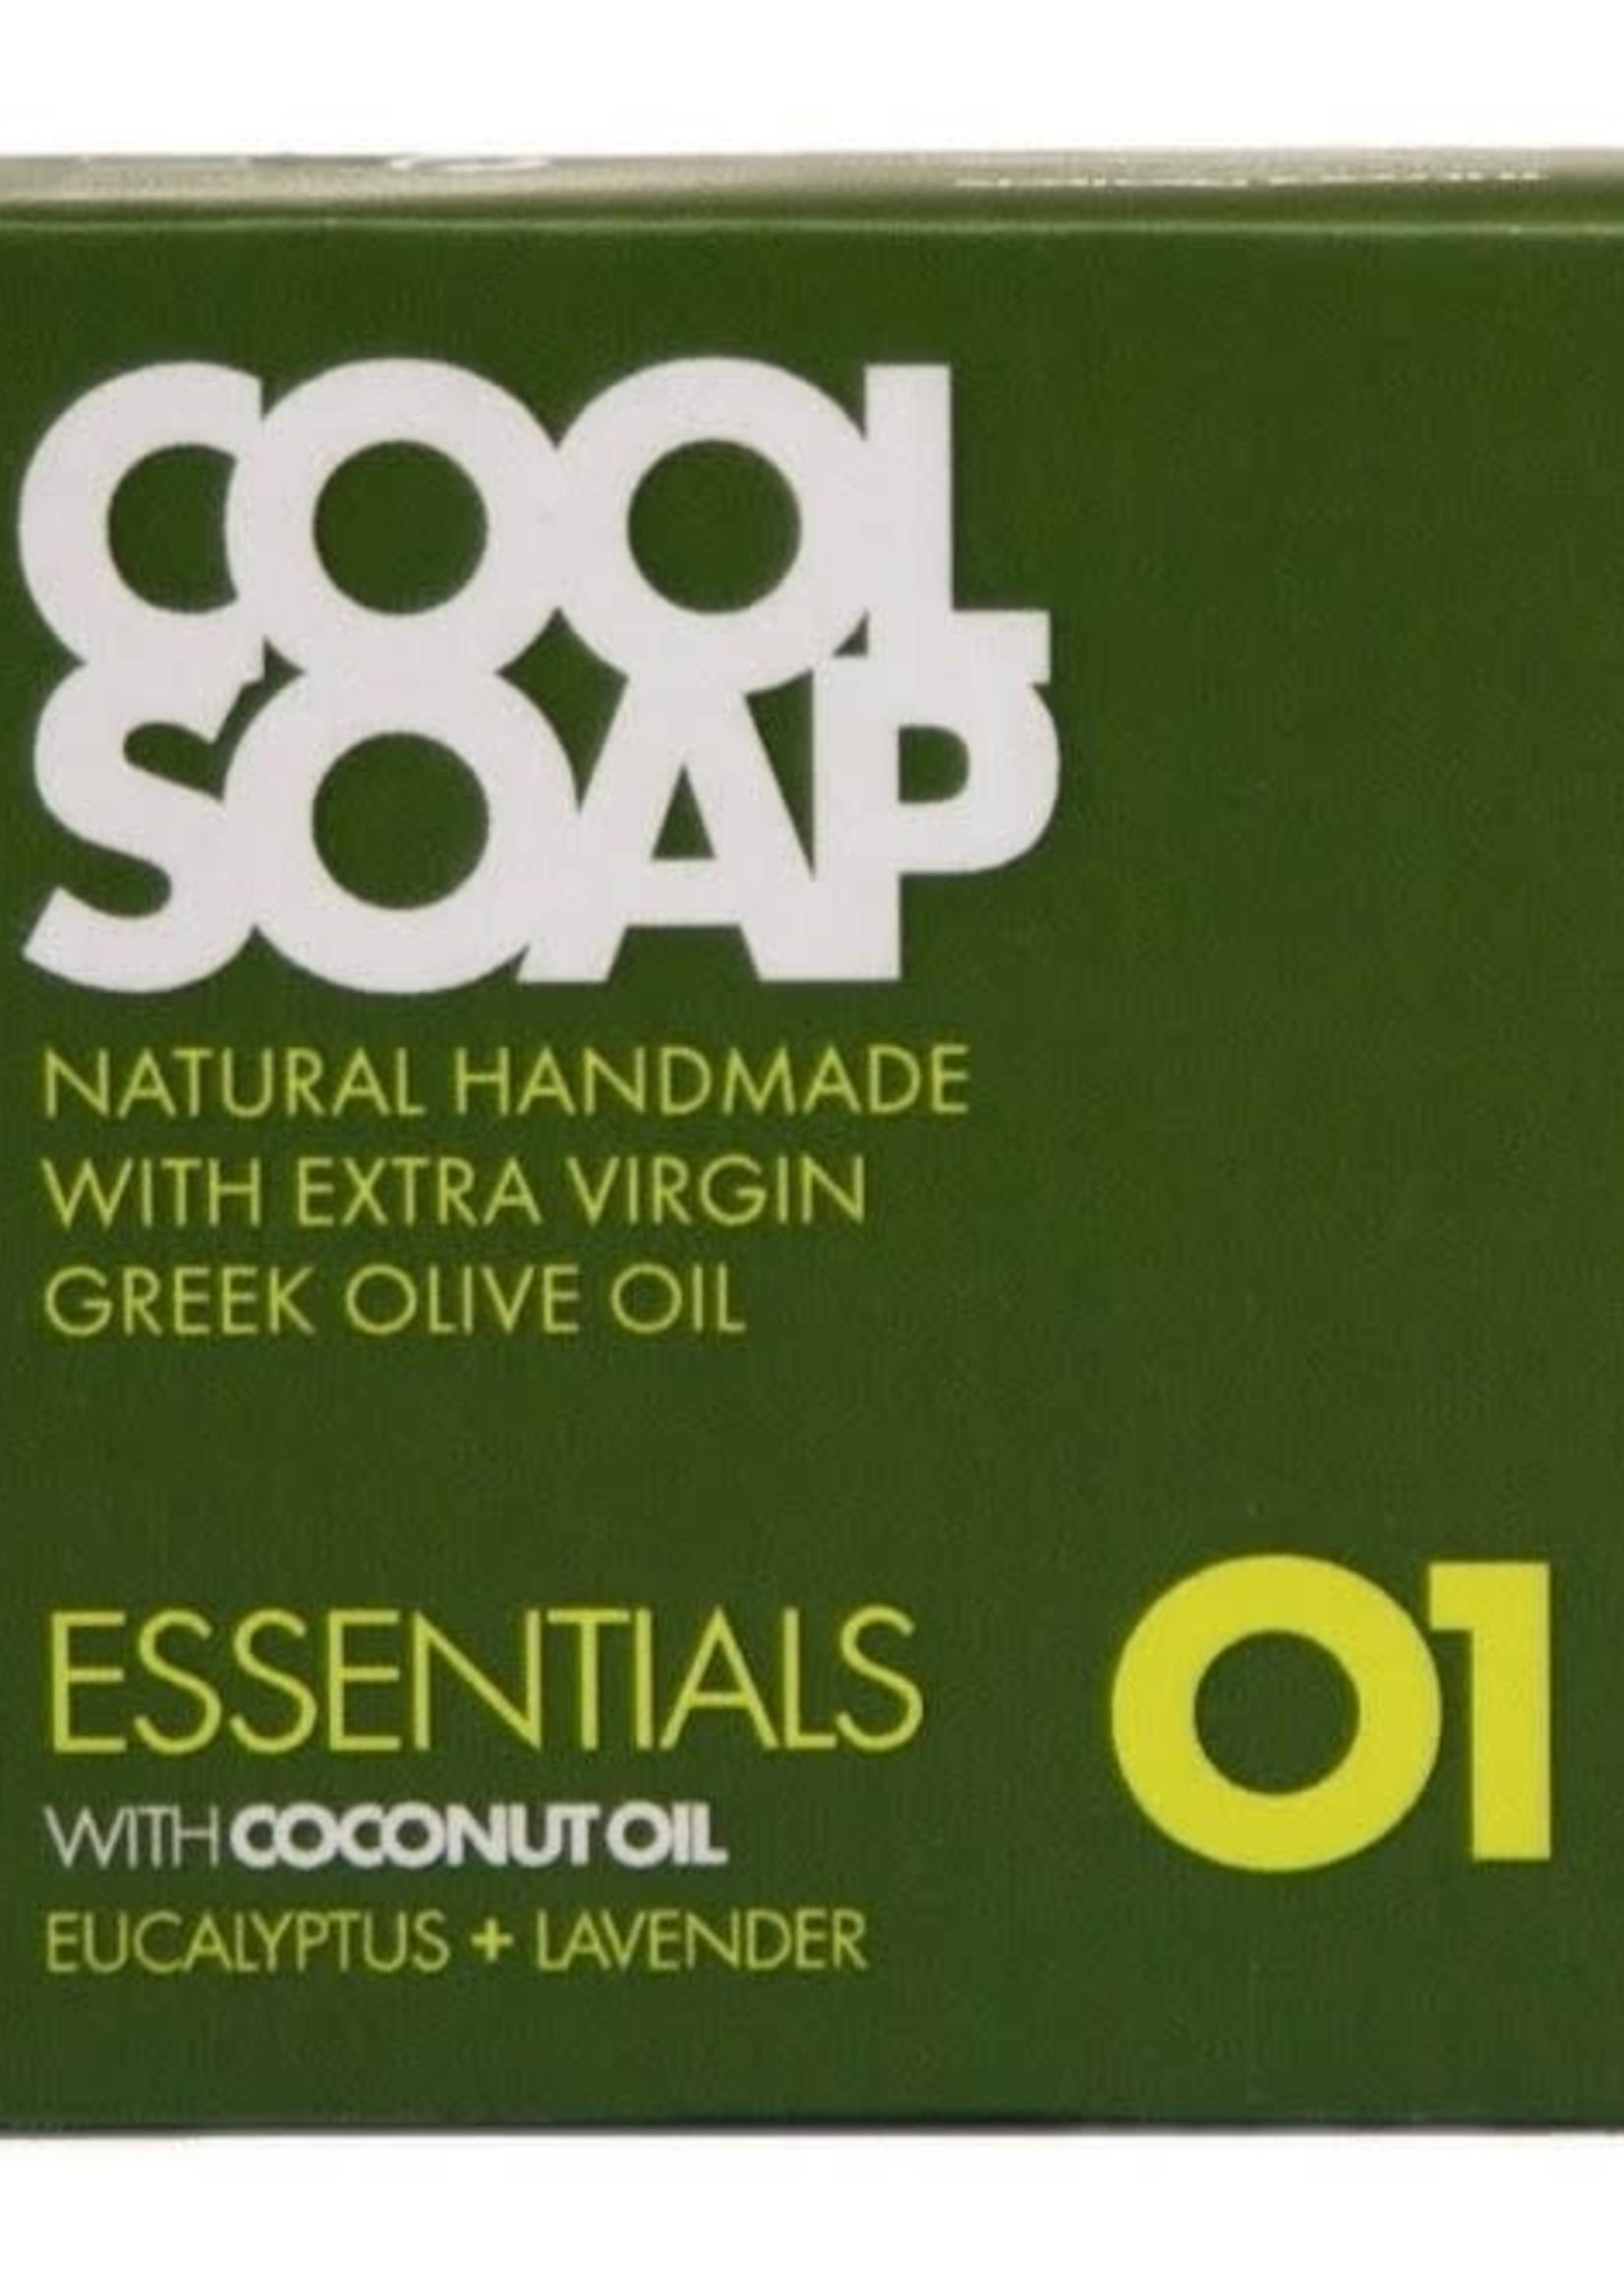 Cool Soap Cool Soap Essentials 01 - met Cocos Olie,  Lavendel en Eucalyptus